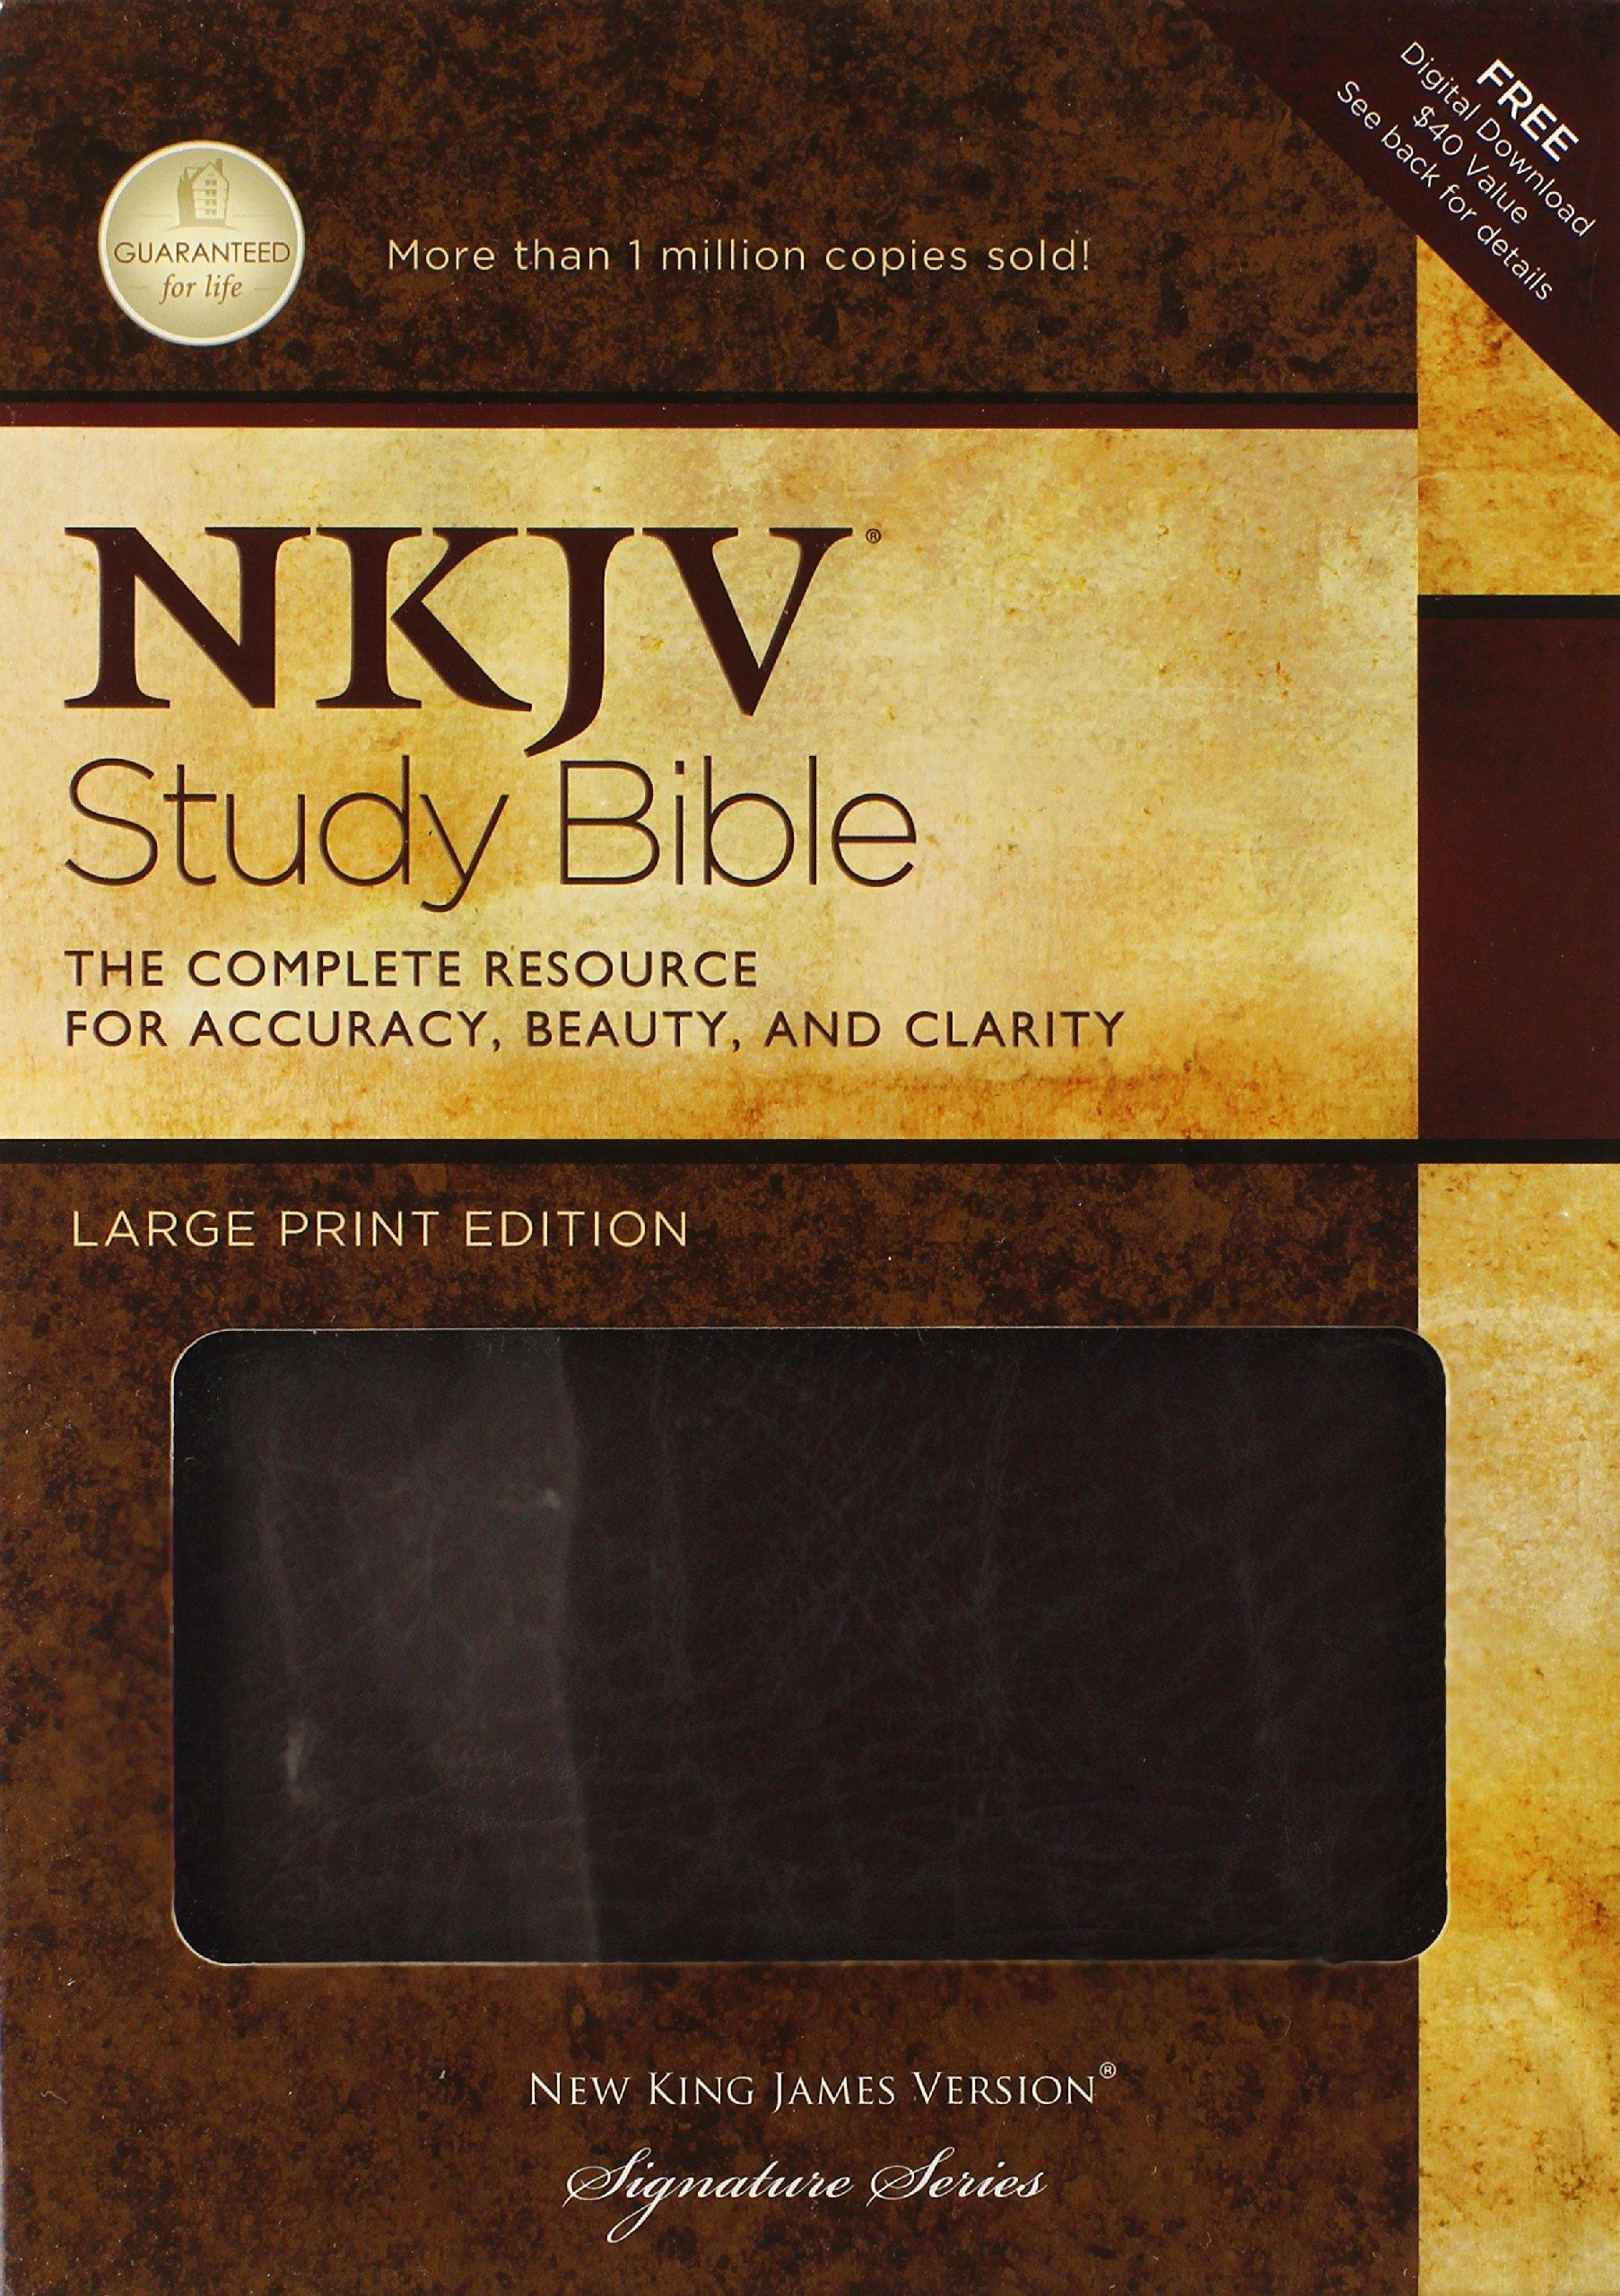 NKJV Study Bible, Large Print, Bonded Leather, Burgundy: Large Print Edition